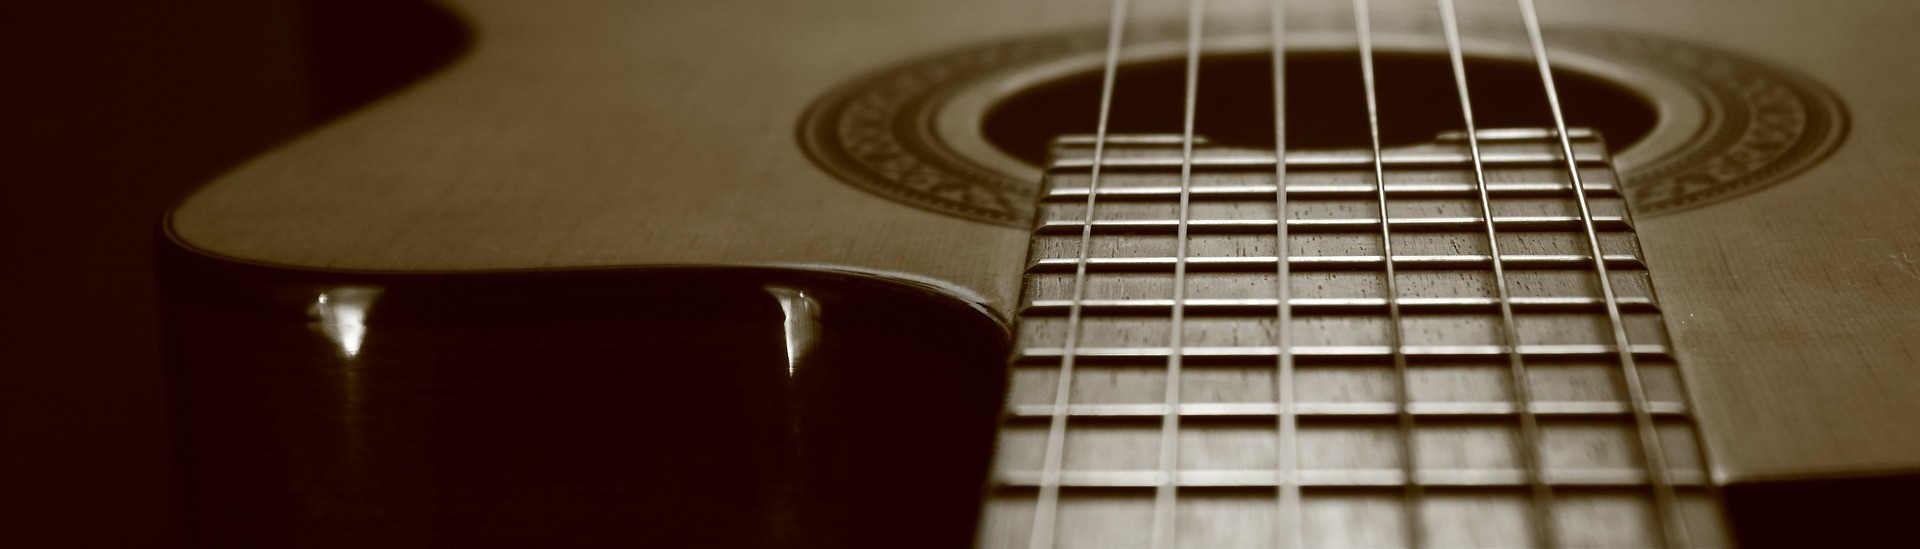 cropped-guitar-56917_1920.jpg